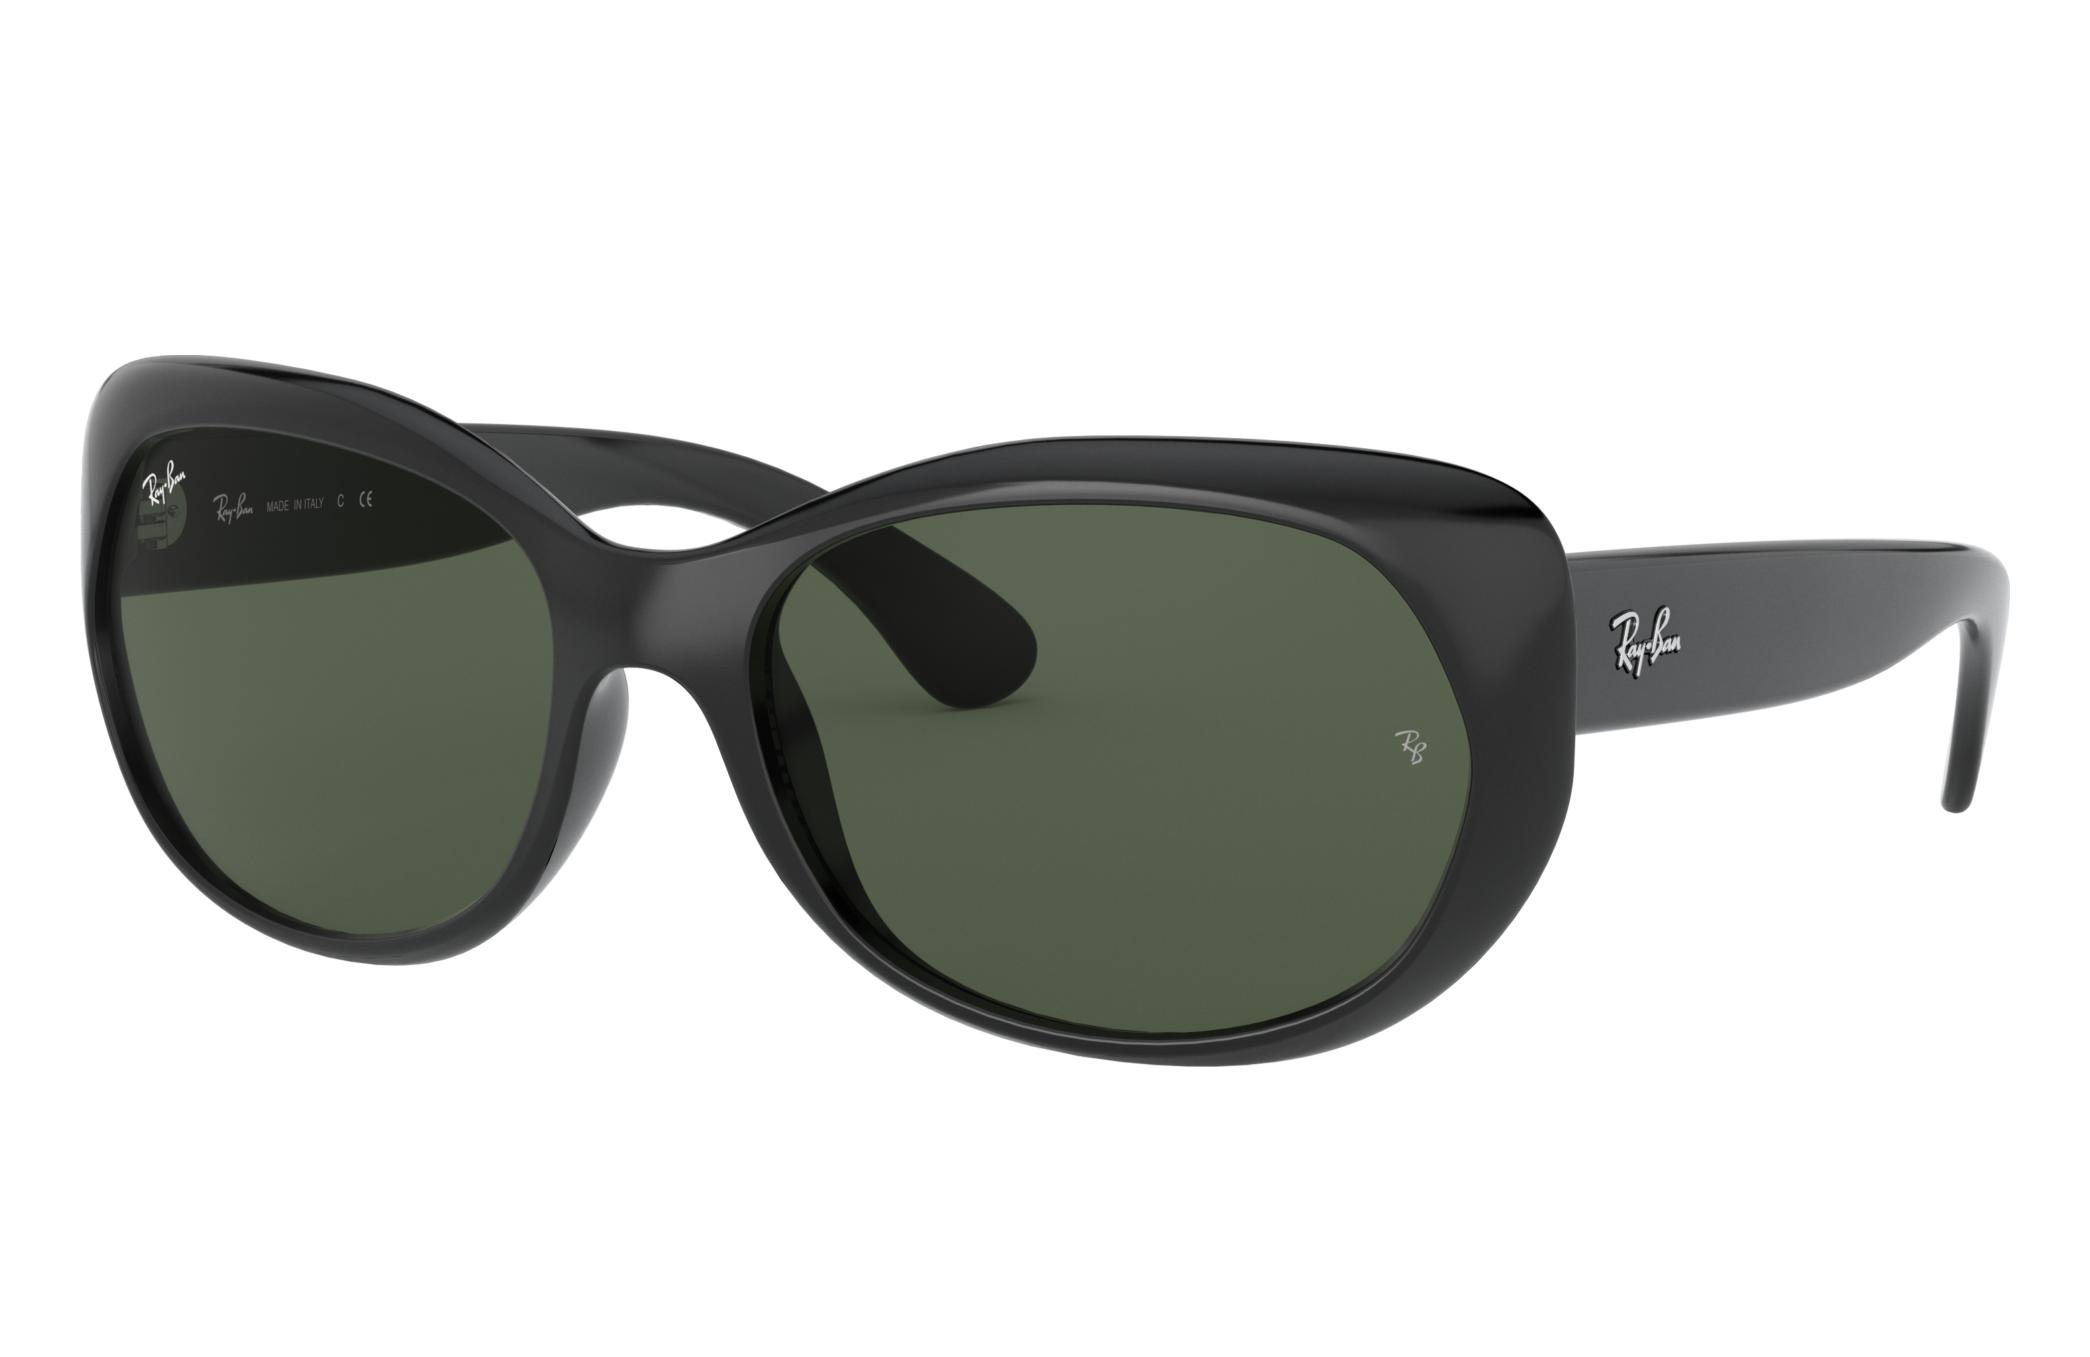 Ray-Ban Rb4325 Low Bridge Fit Black, Green Lenses - RB4325F